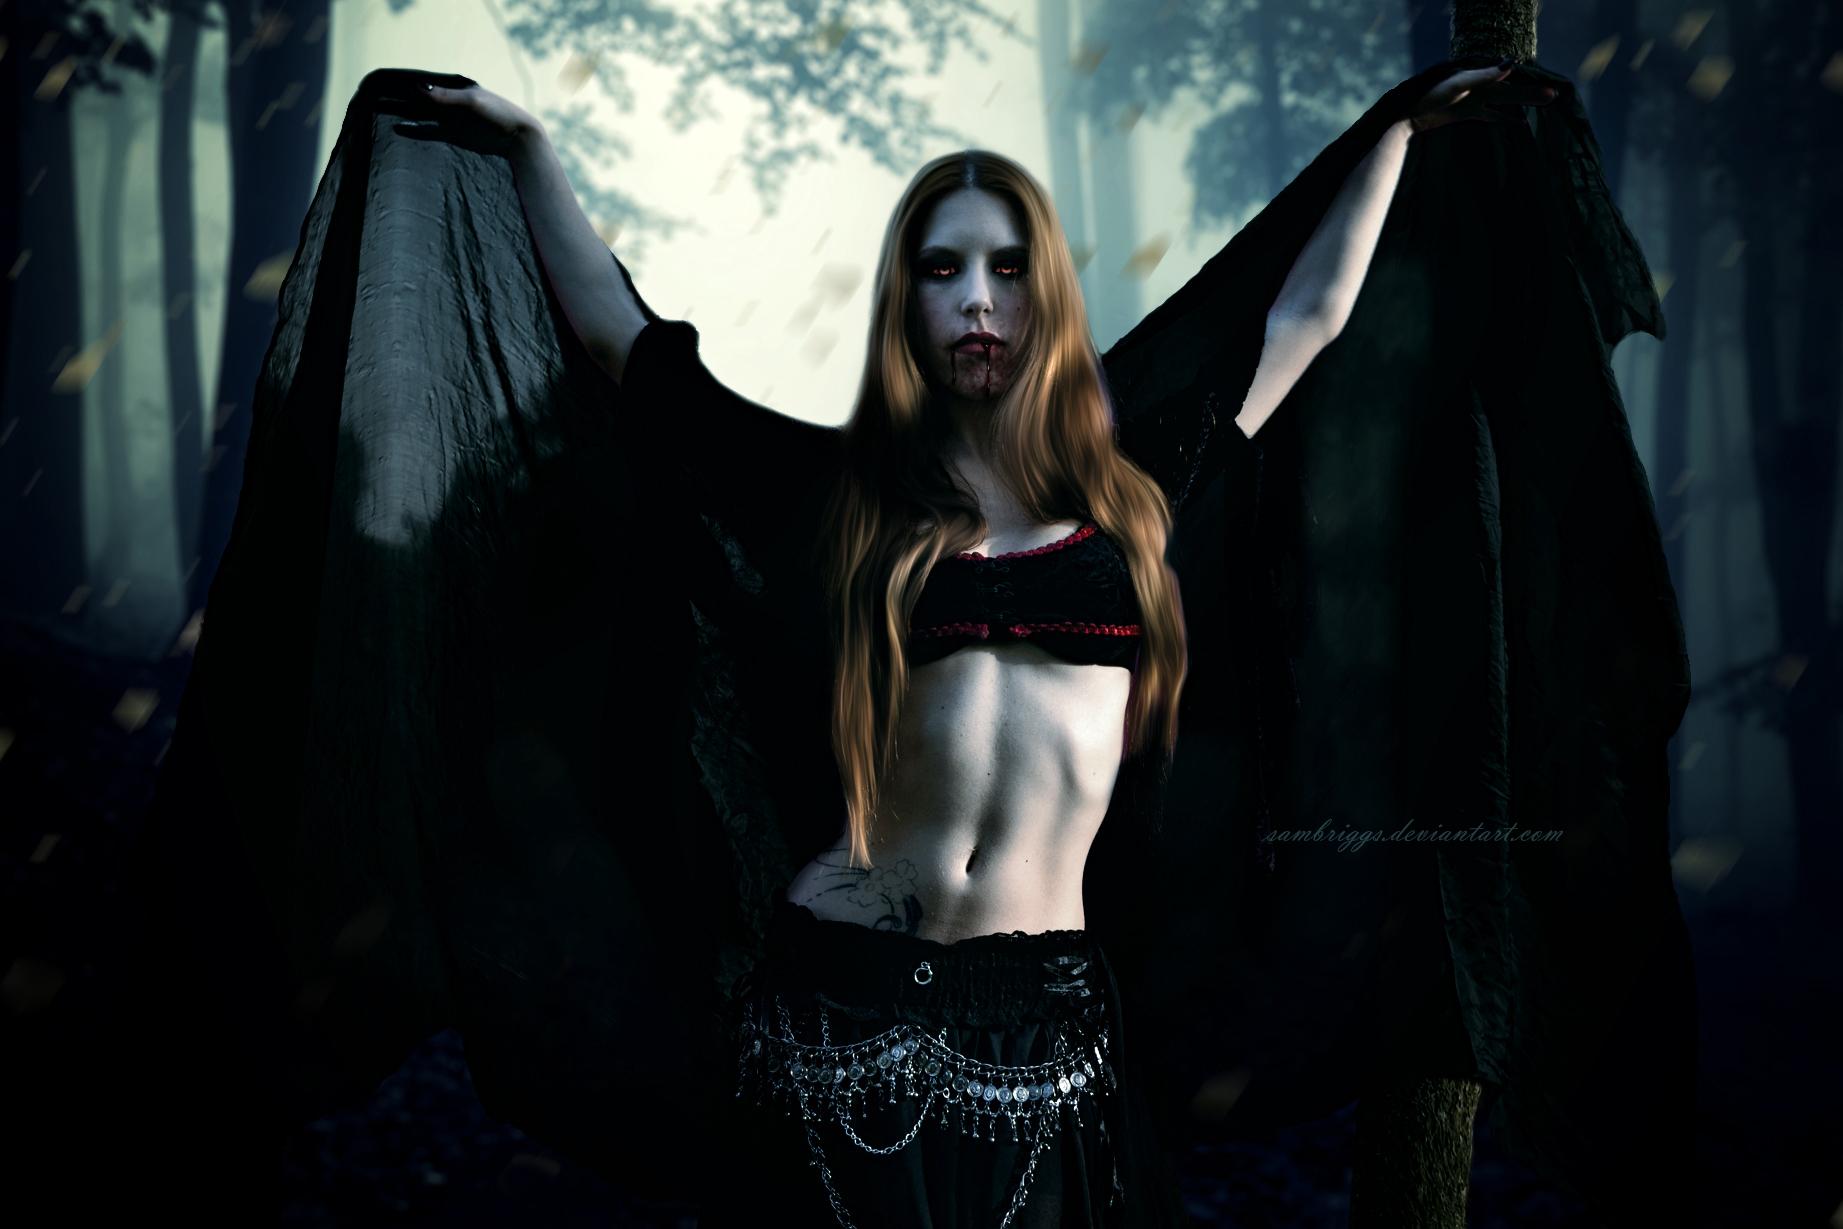 skyrim vampire wallpaper - photo #16